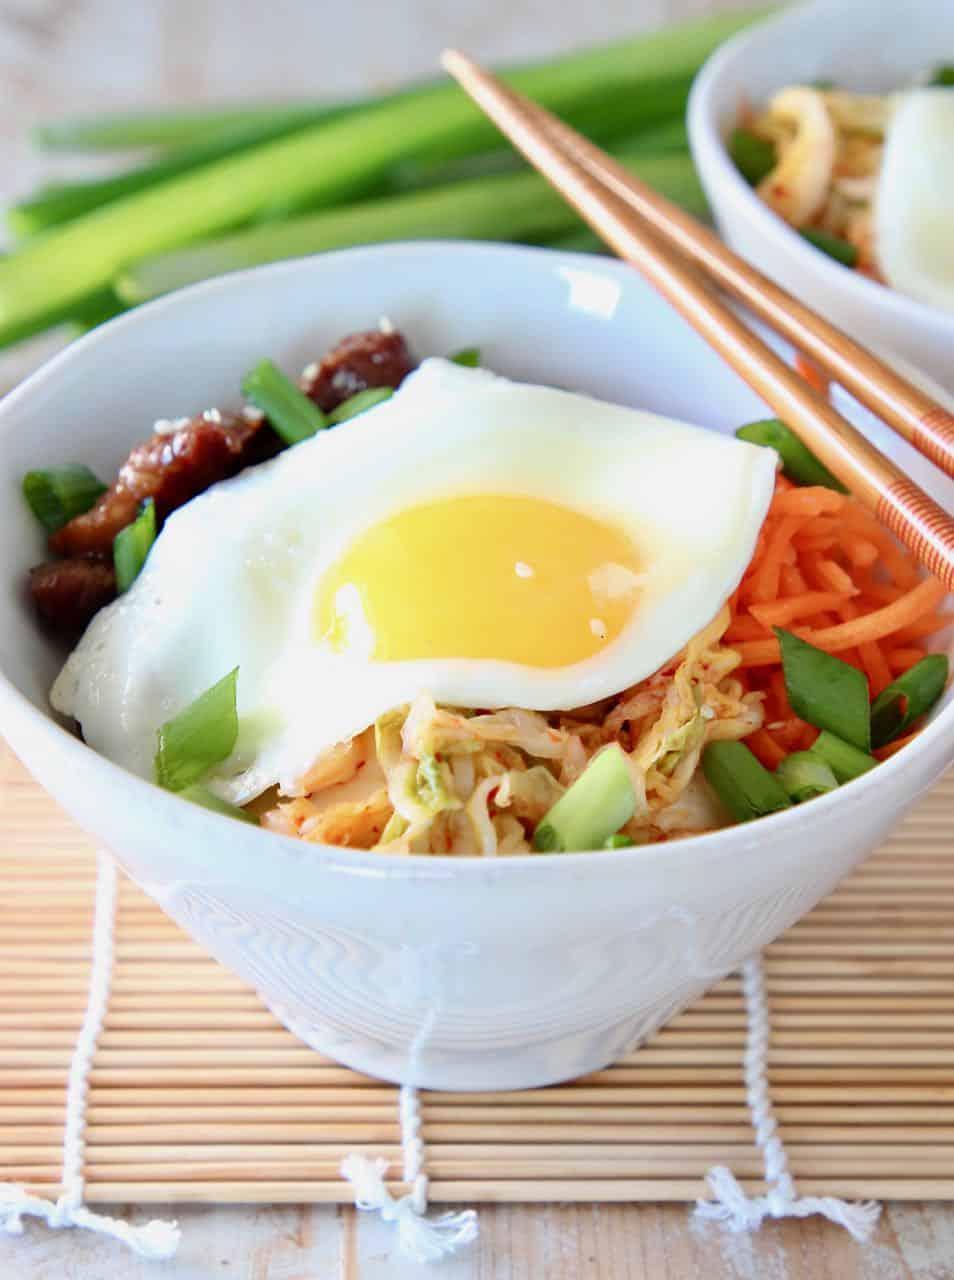 Korean BBQ Cauliflower Rice Bowl topped with a fried egg and chopsticks